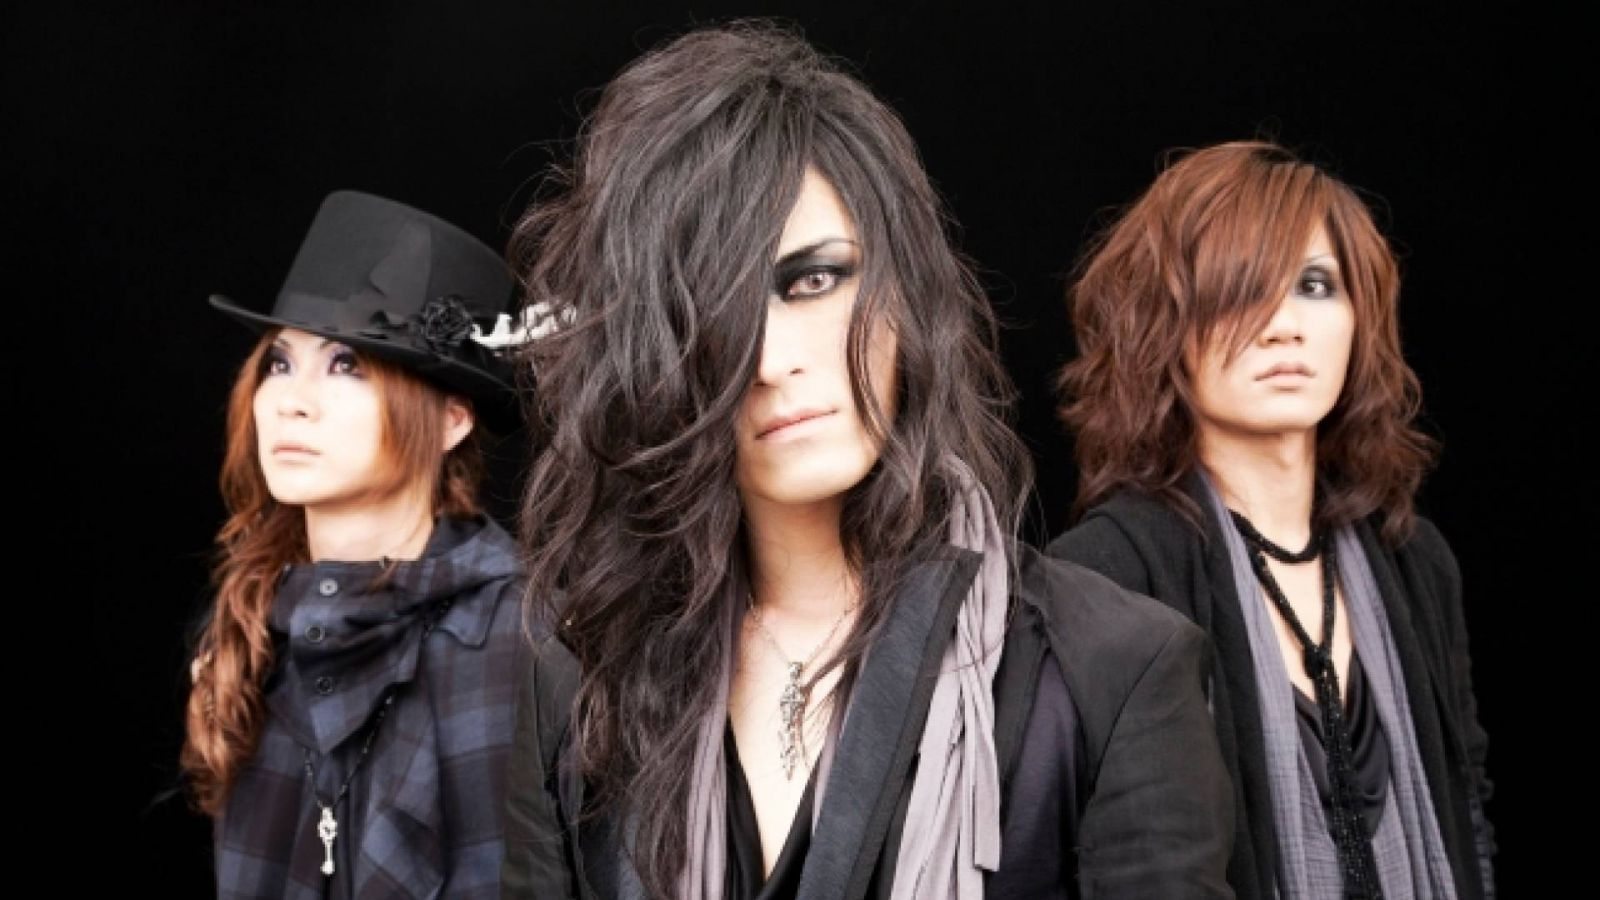 9GOATS BLACK OUT to Disband © Reiko Arakawa